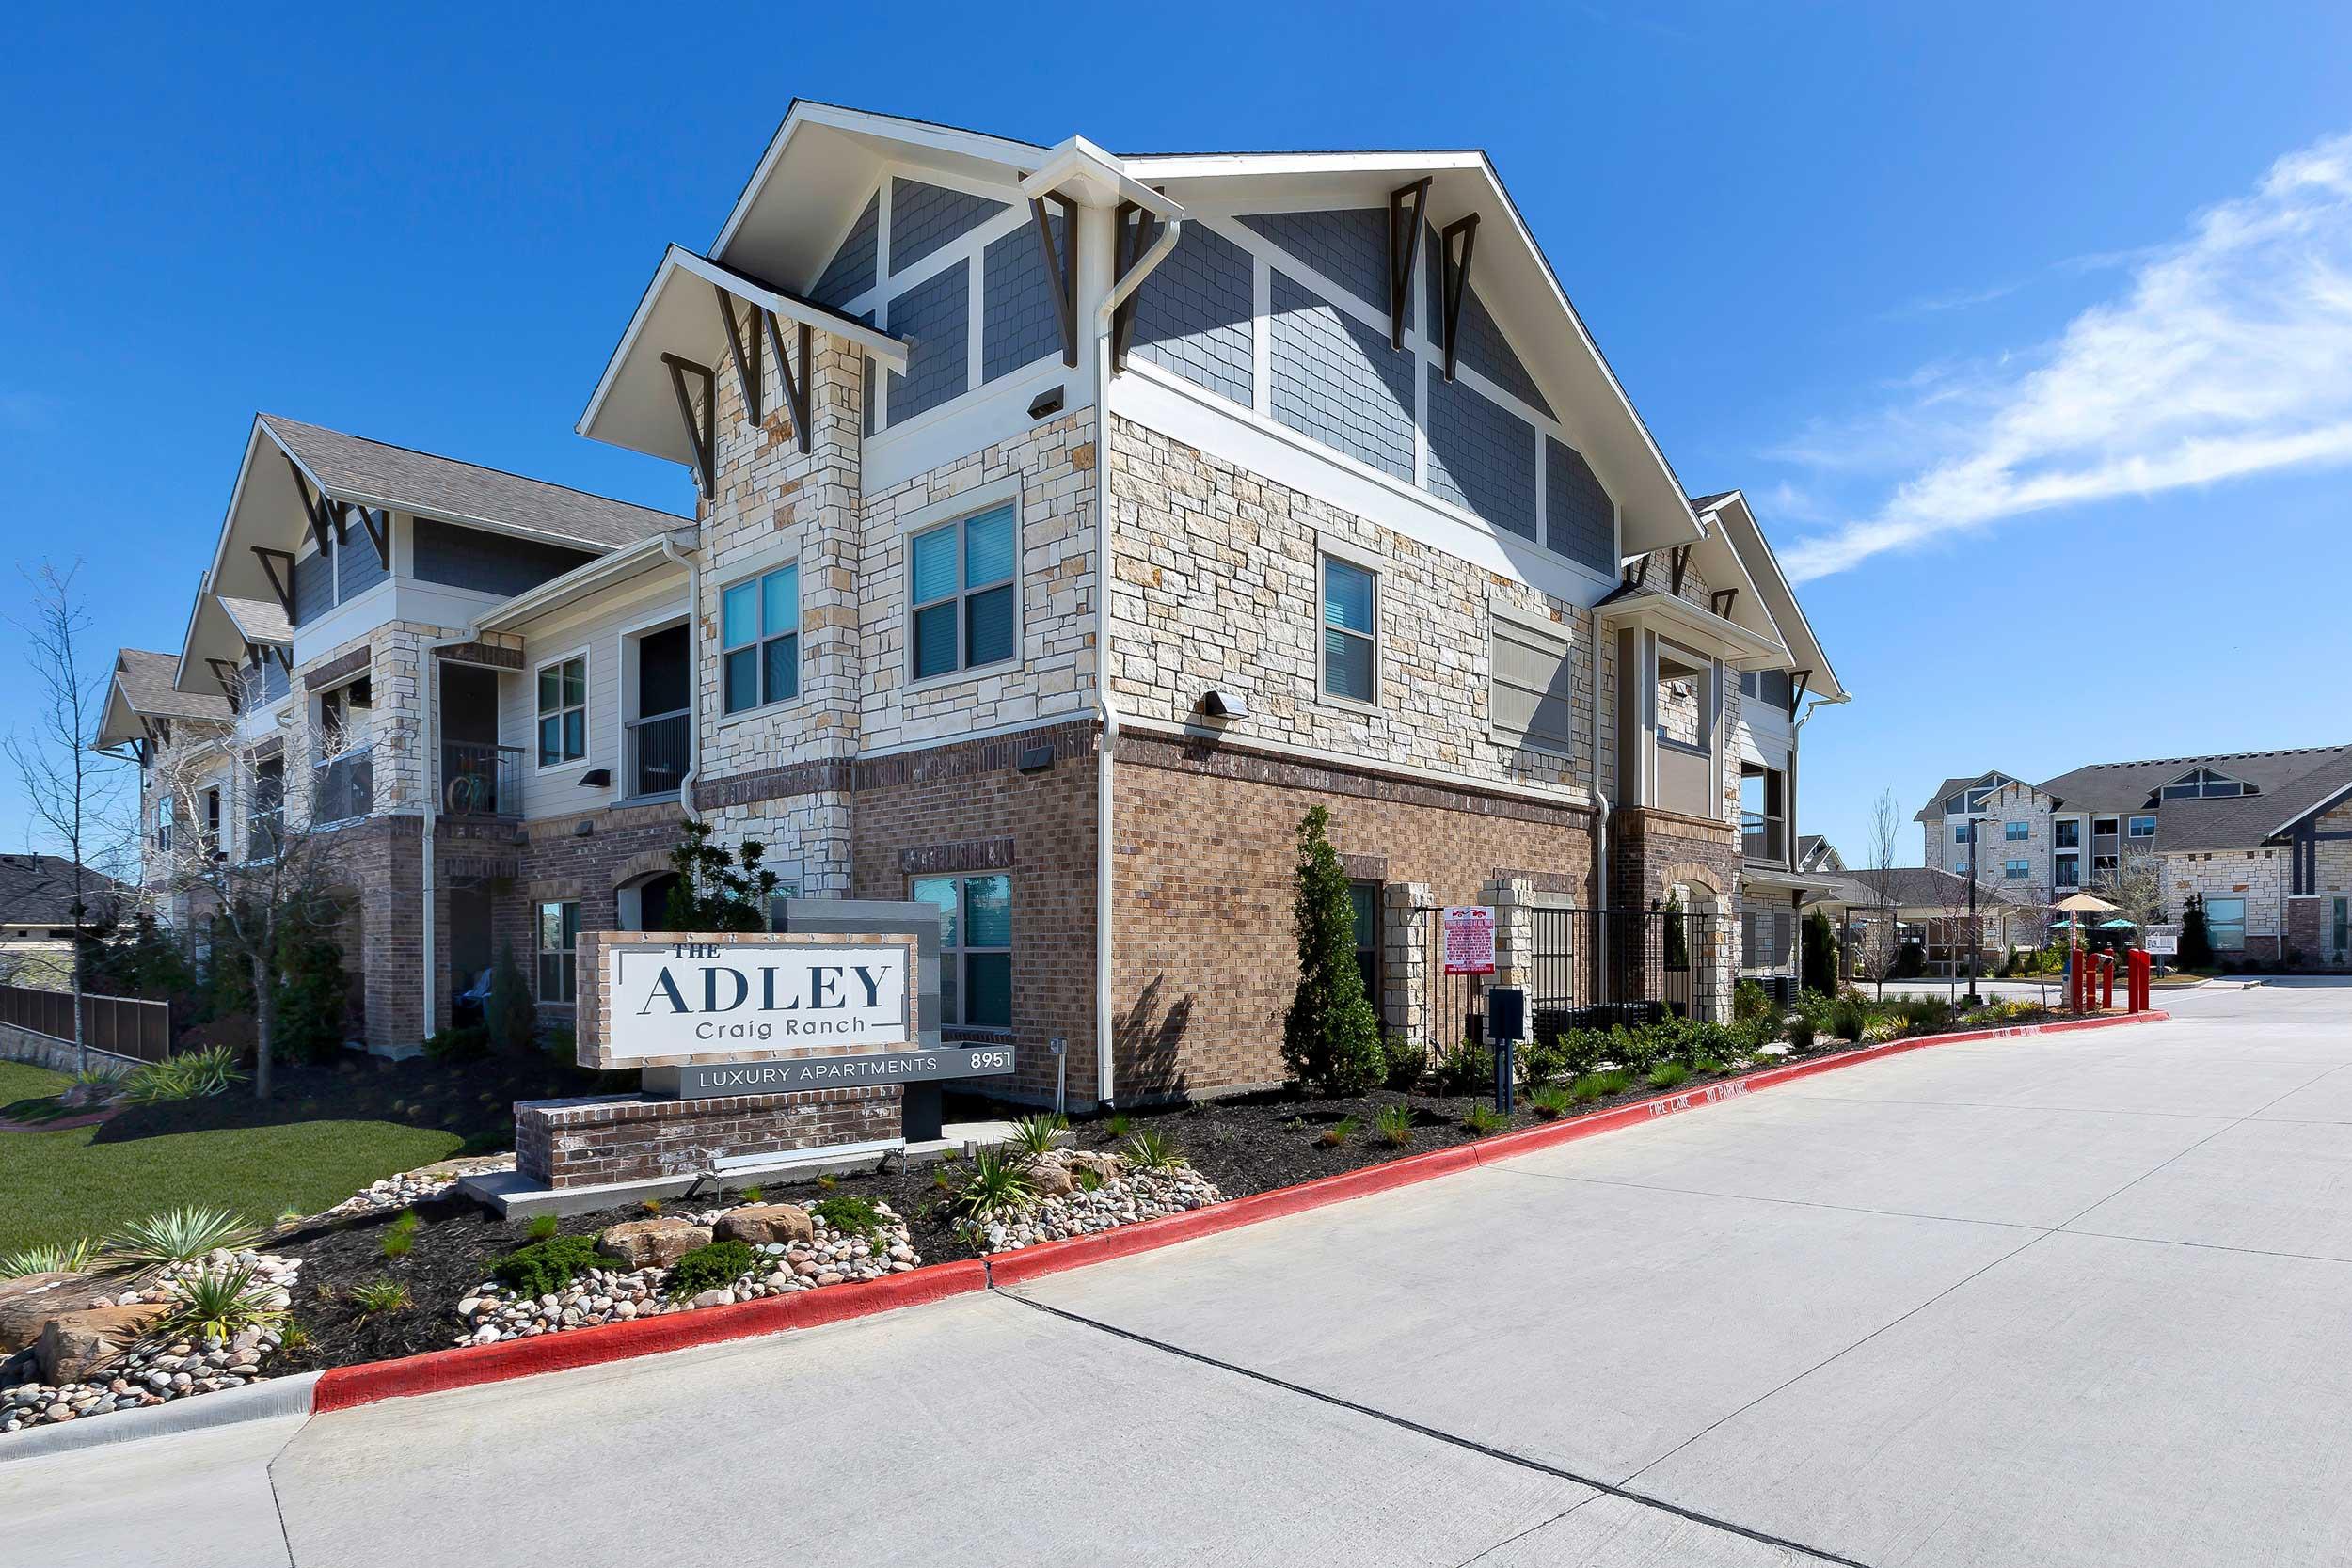 Apartments Near Collin College The Adley Craig Ranch Apartment Homes for Collin College Students in McKinney, TX